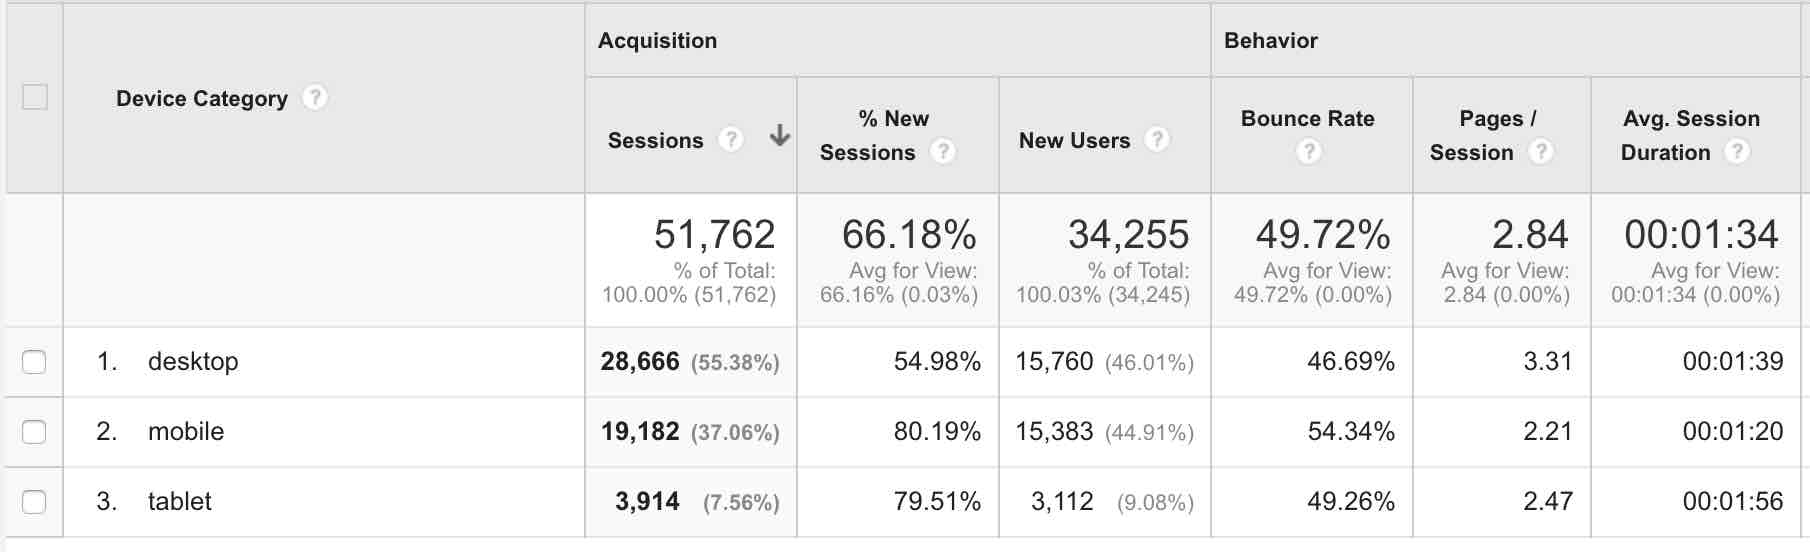 Sample Google Analytics Report